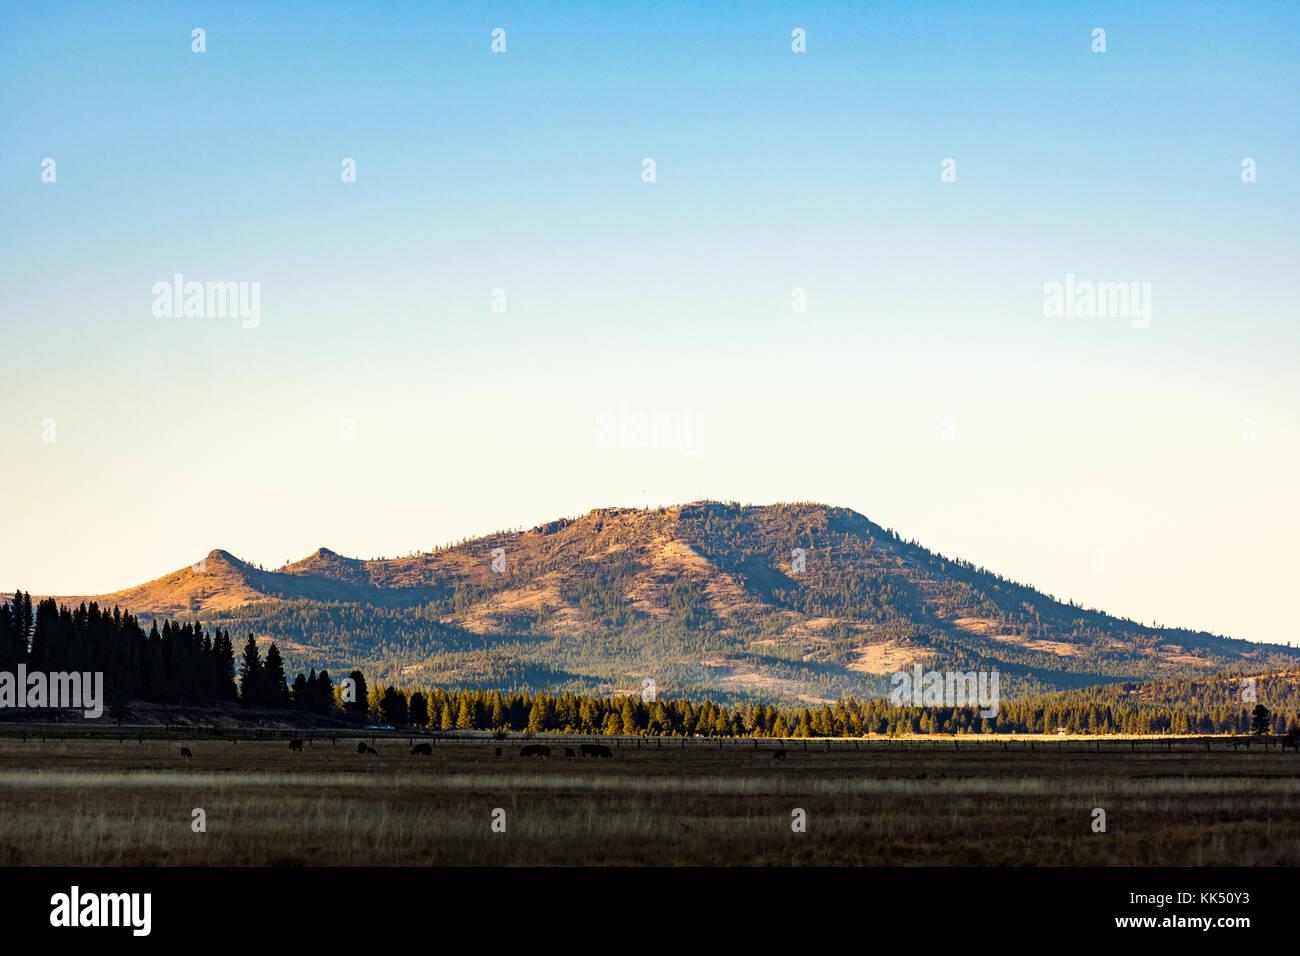 Plumas national forest stock photos plumas national for Sierra valley